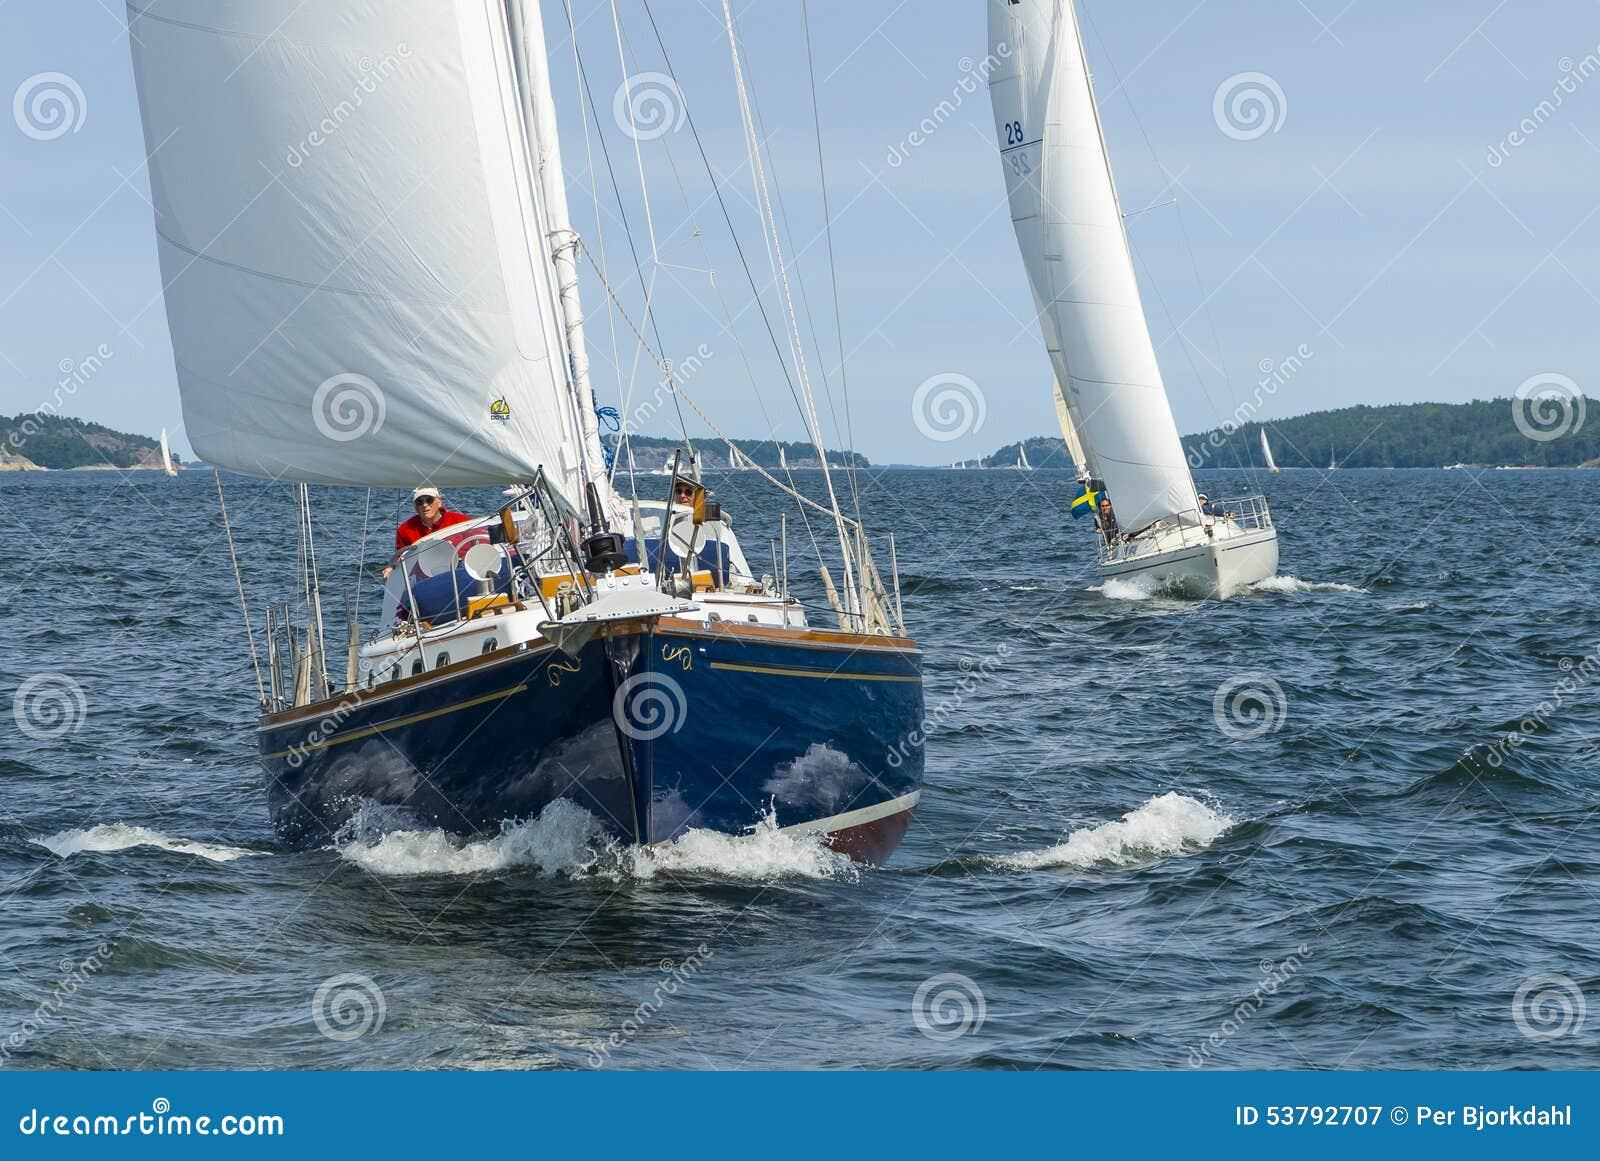 Żeglowanie jachtów Sztokholm archipelag